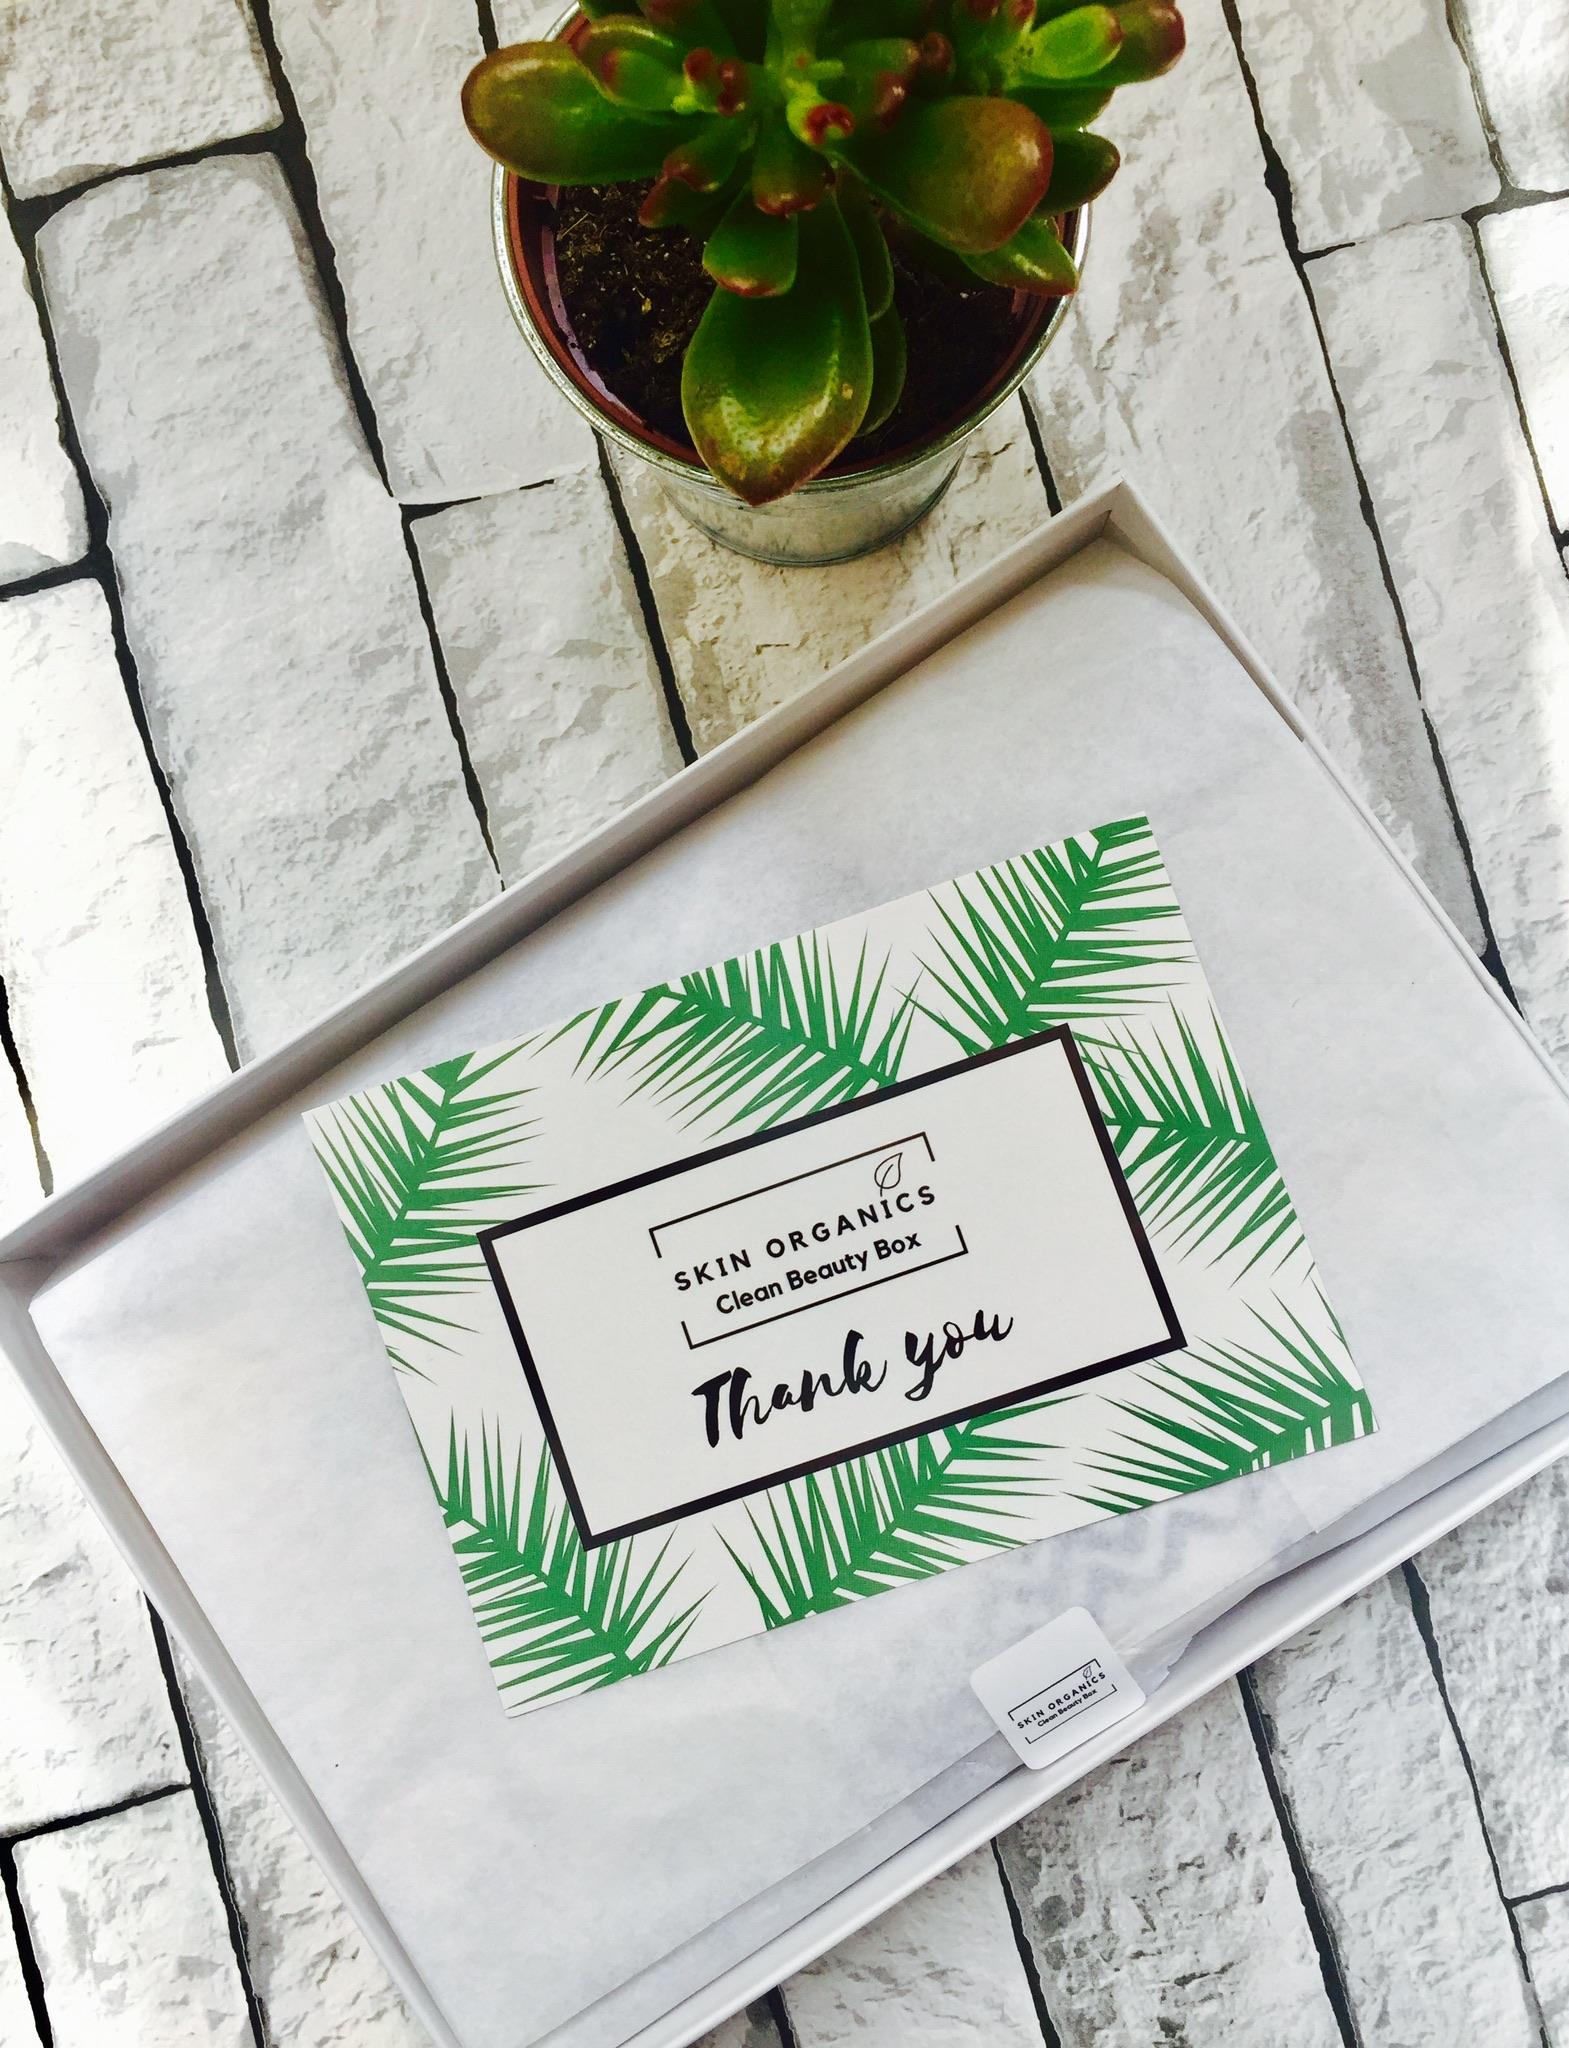 Skin Organics Clean Beauty Box